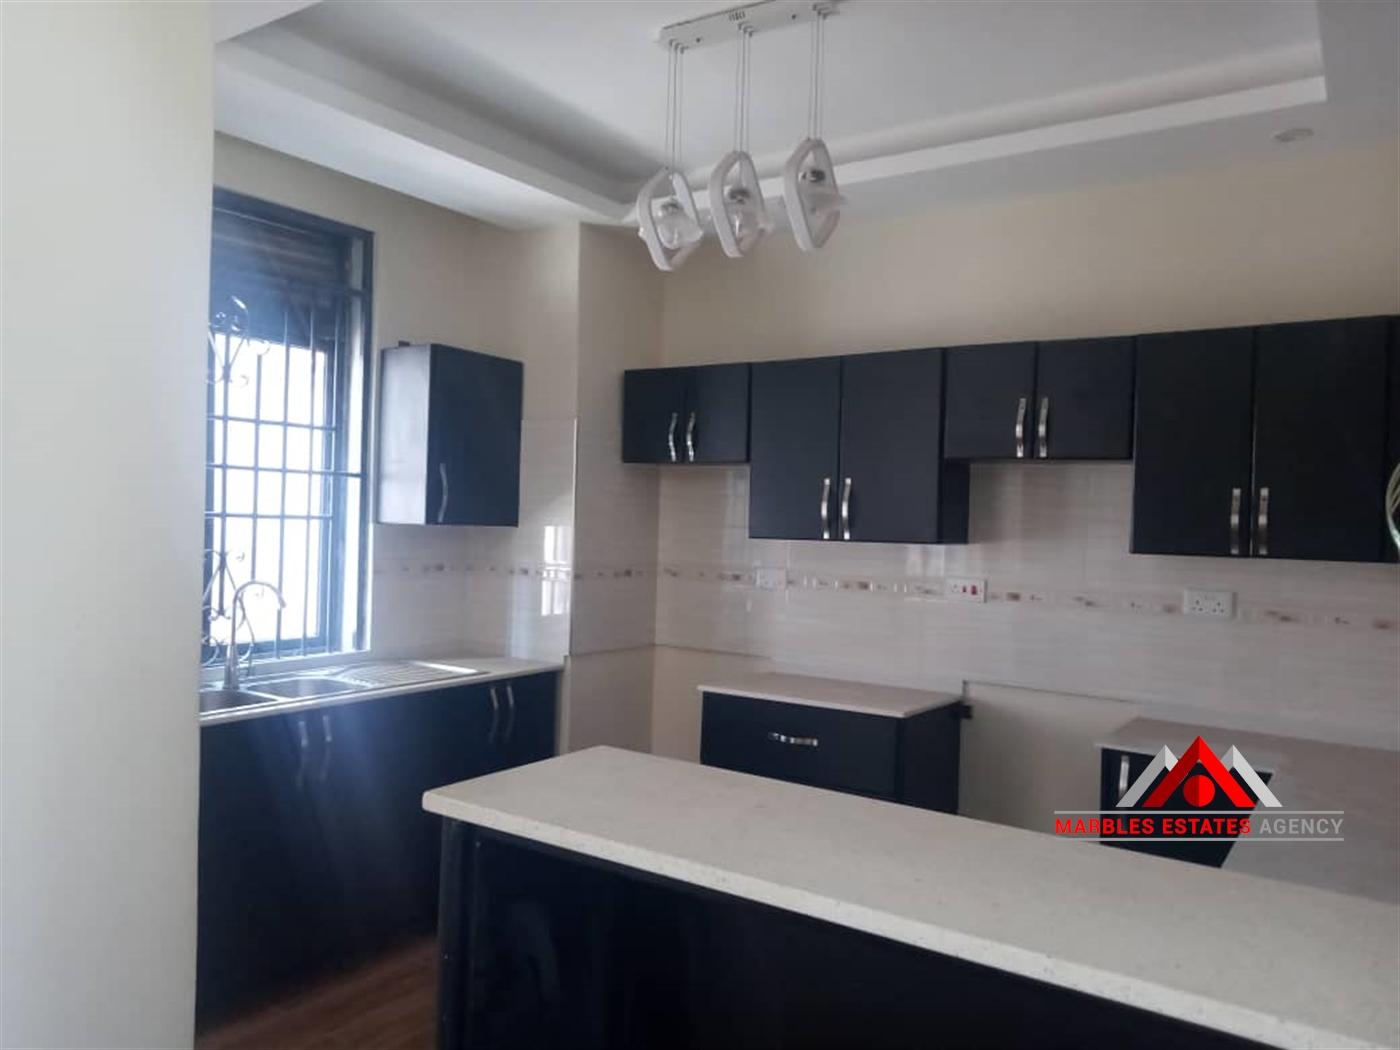 Apartment for rent in Kalungu Kampala